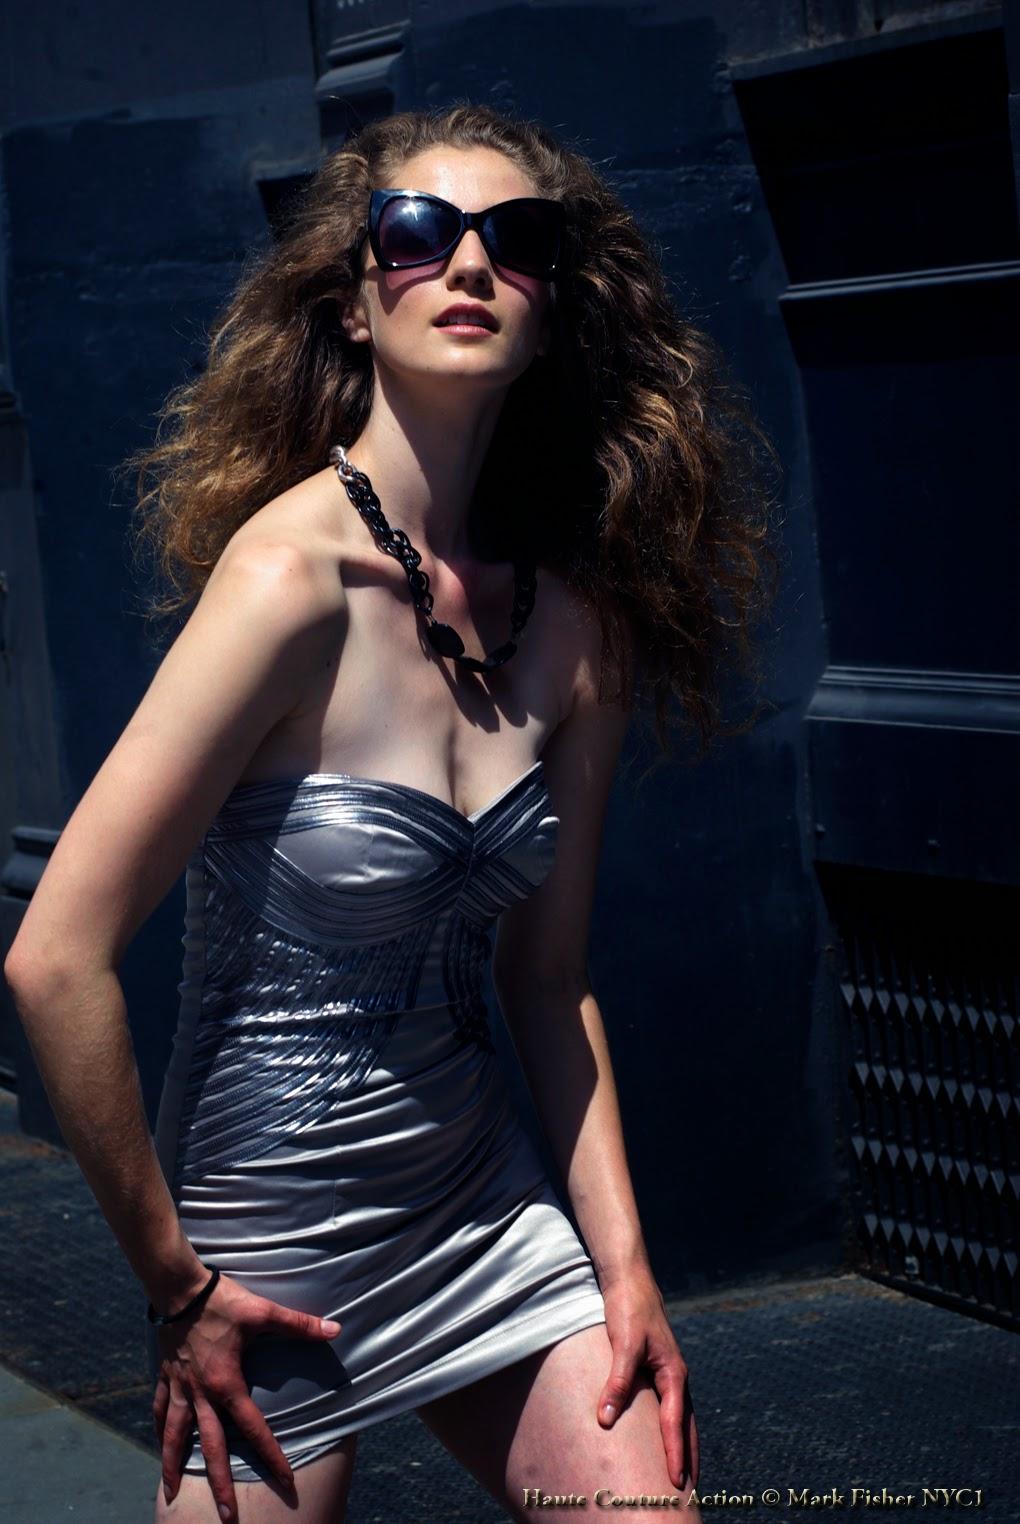 Mark fisher american photographer haute couture action for American haute couture